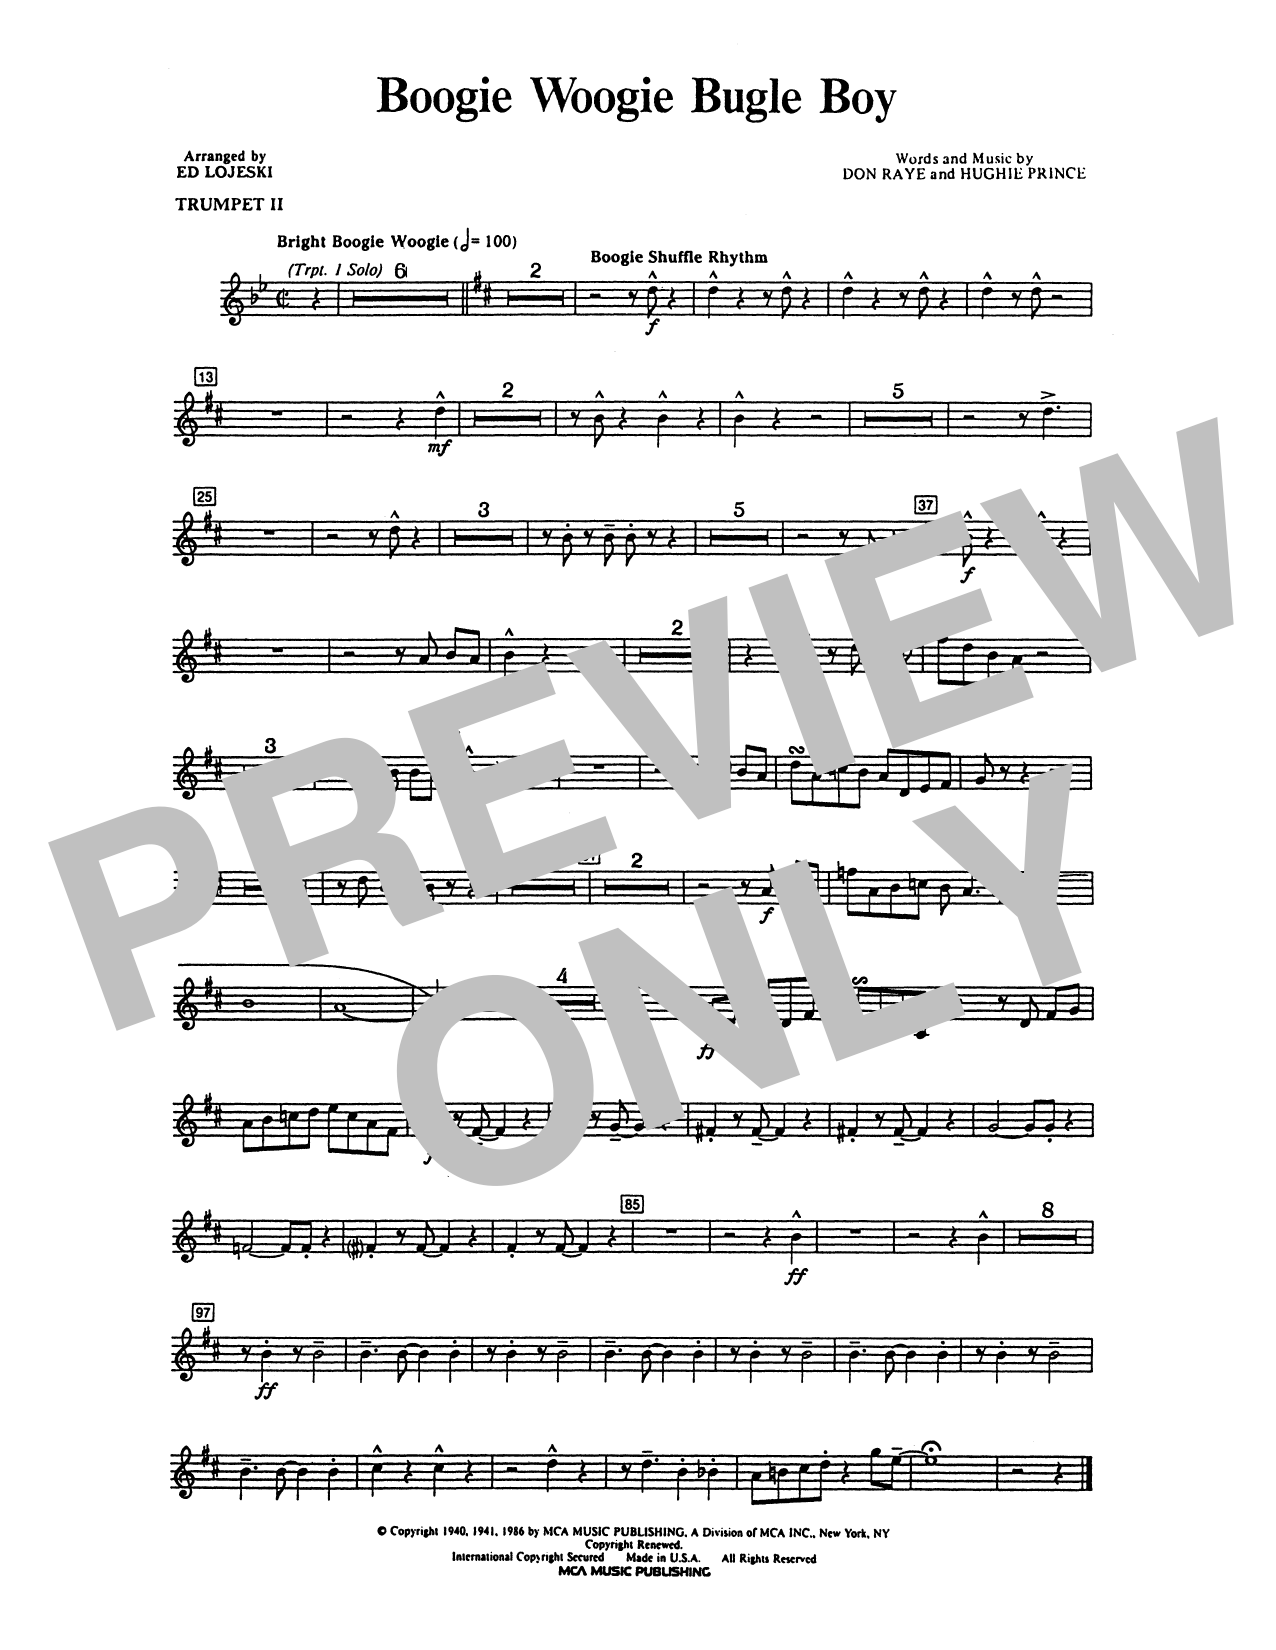 Boogie Woogie Bugle Boy - Trumpet 2 in Bb Sheet Music